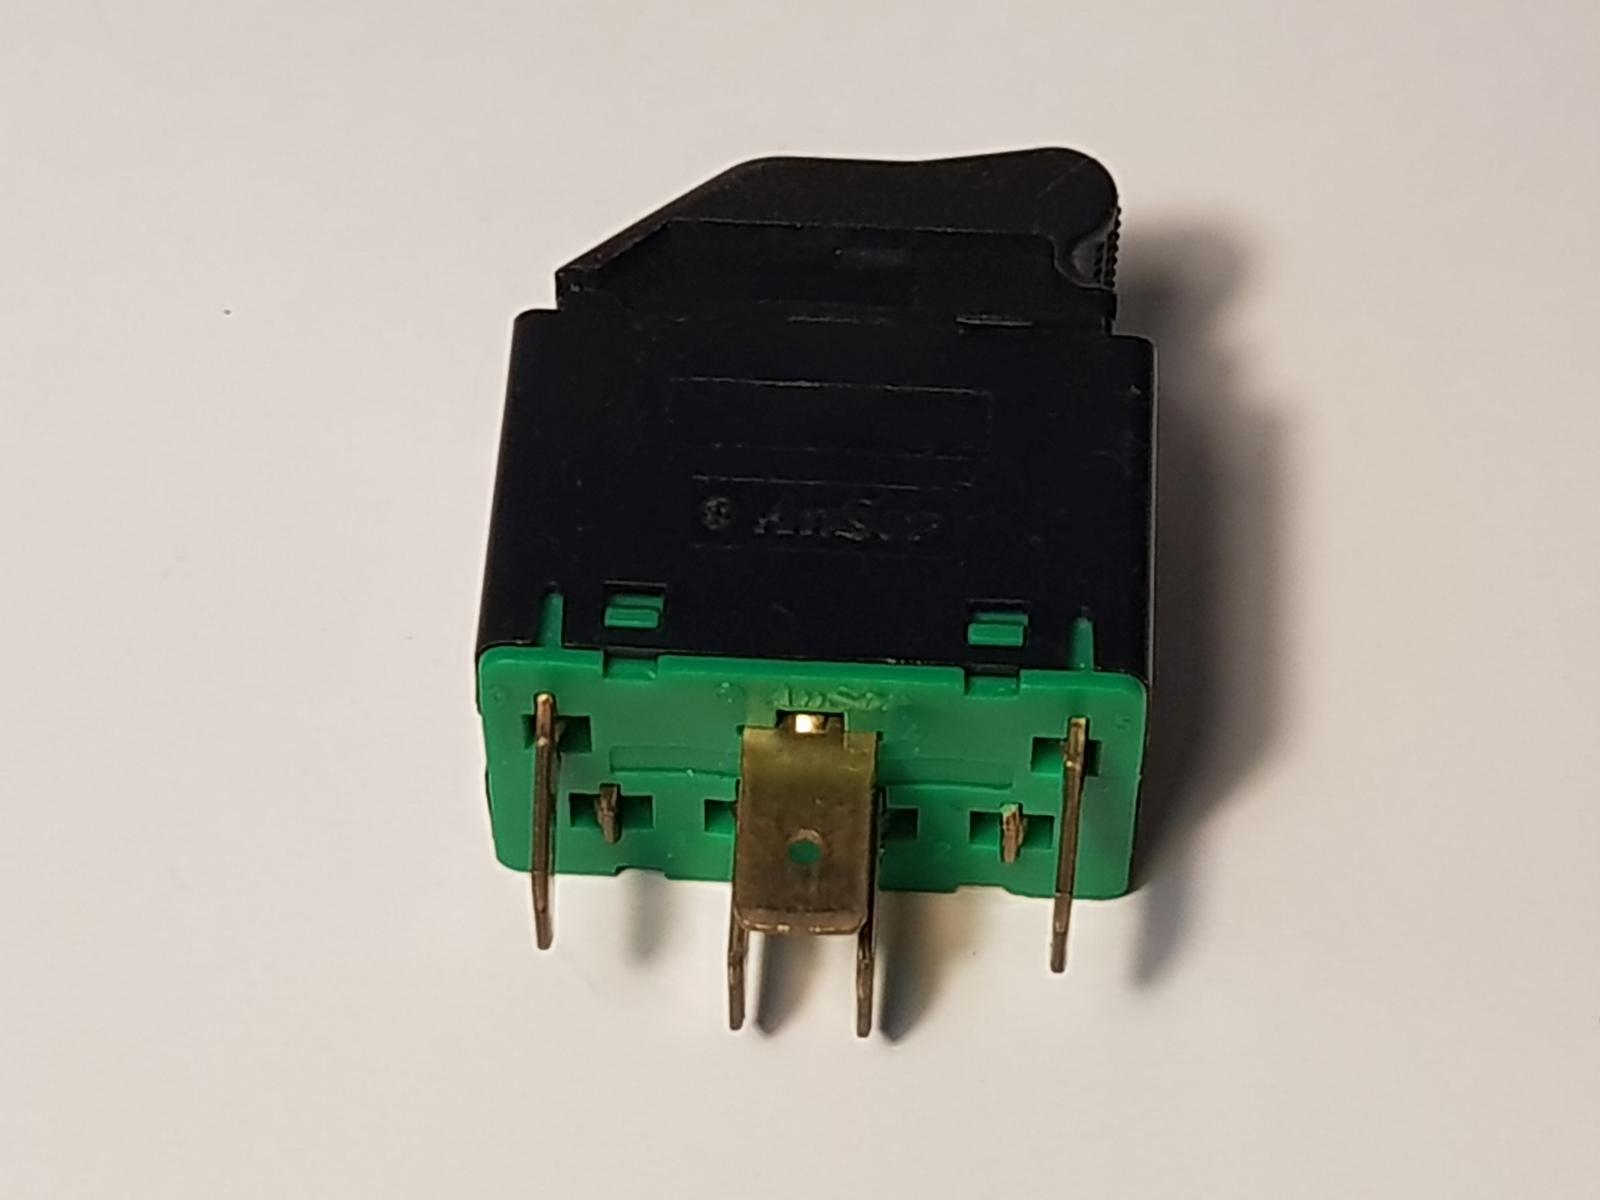 Ansor 1KN2512 Schalter Switch 5-Polig Interrupteur l'interruttore